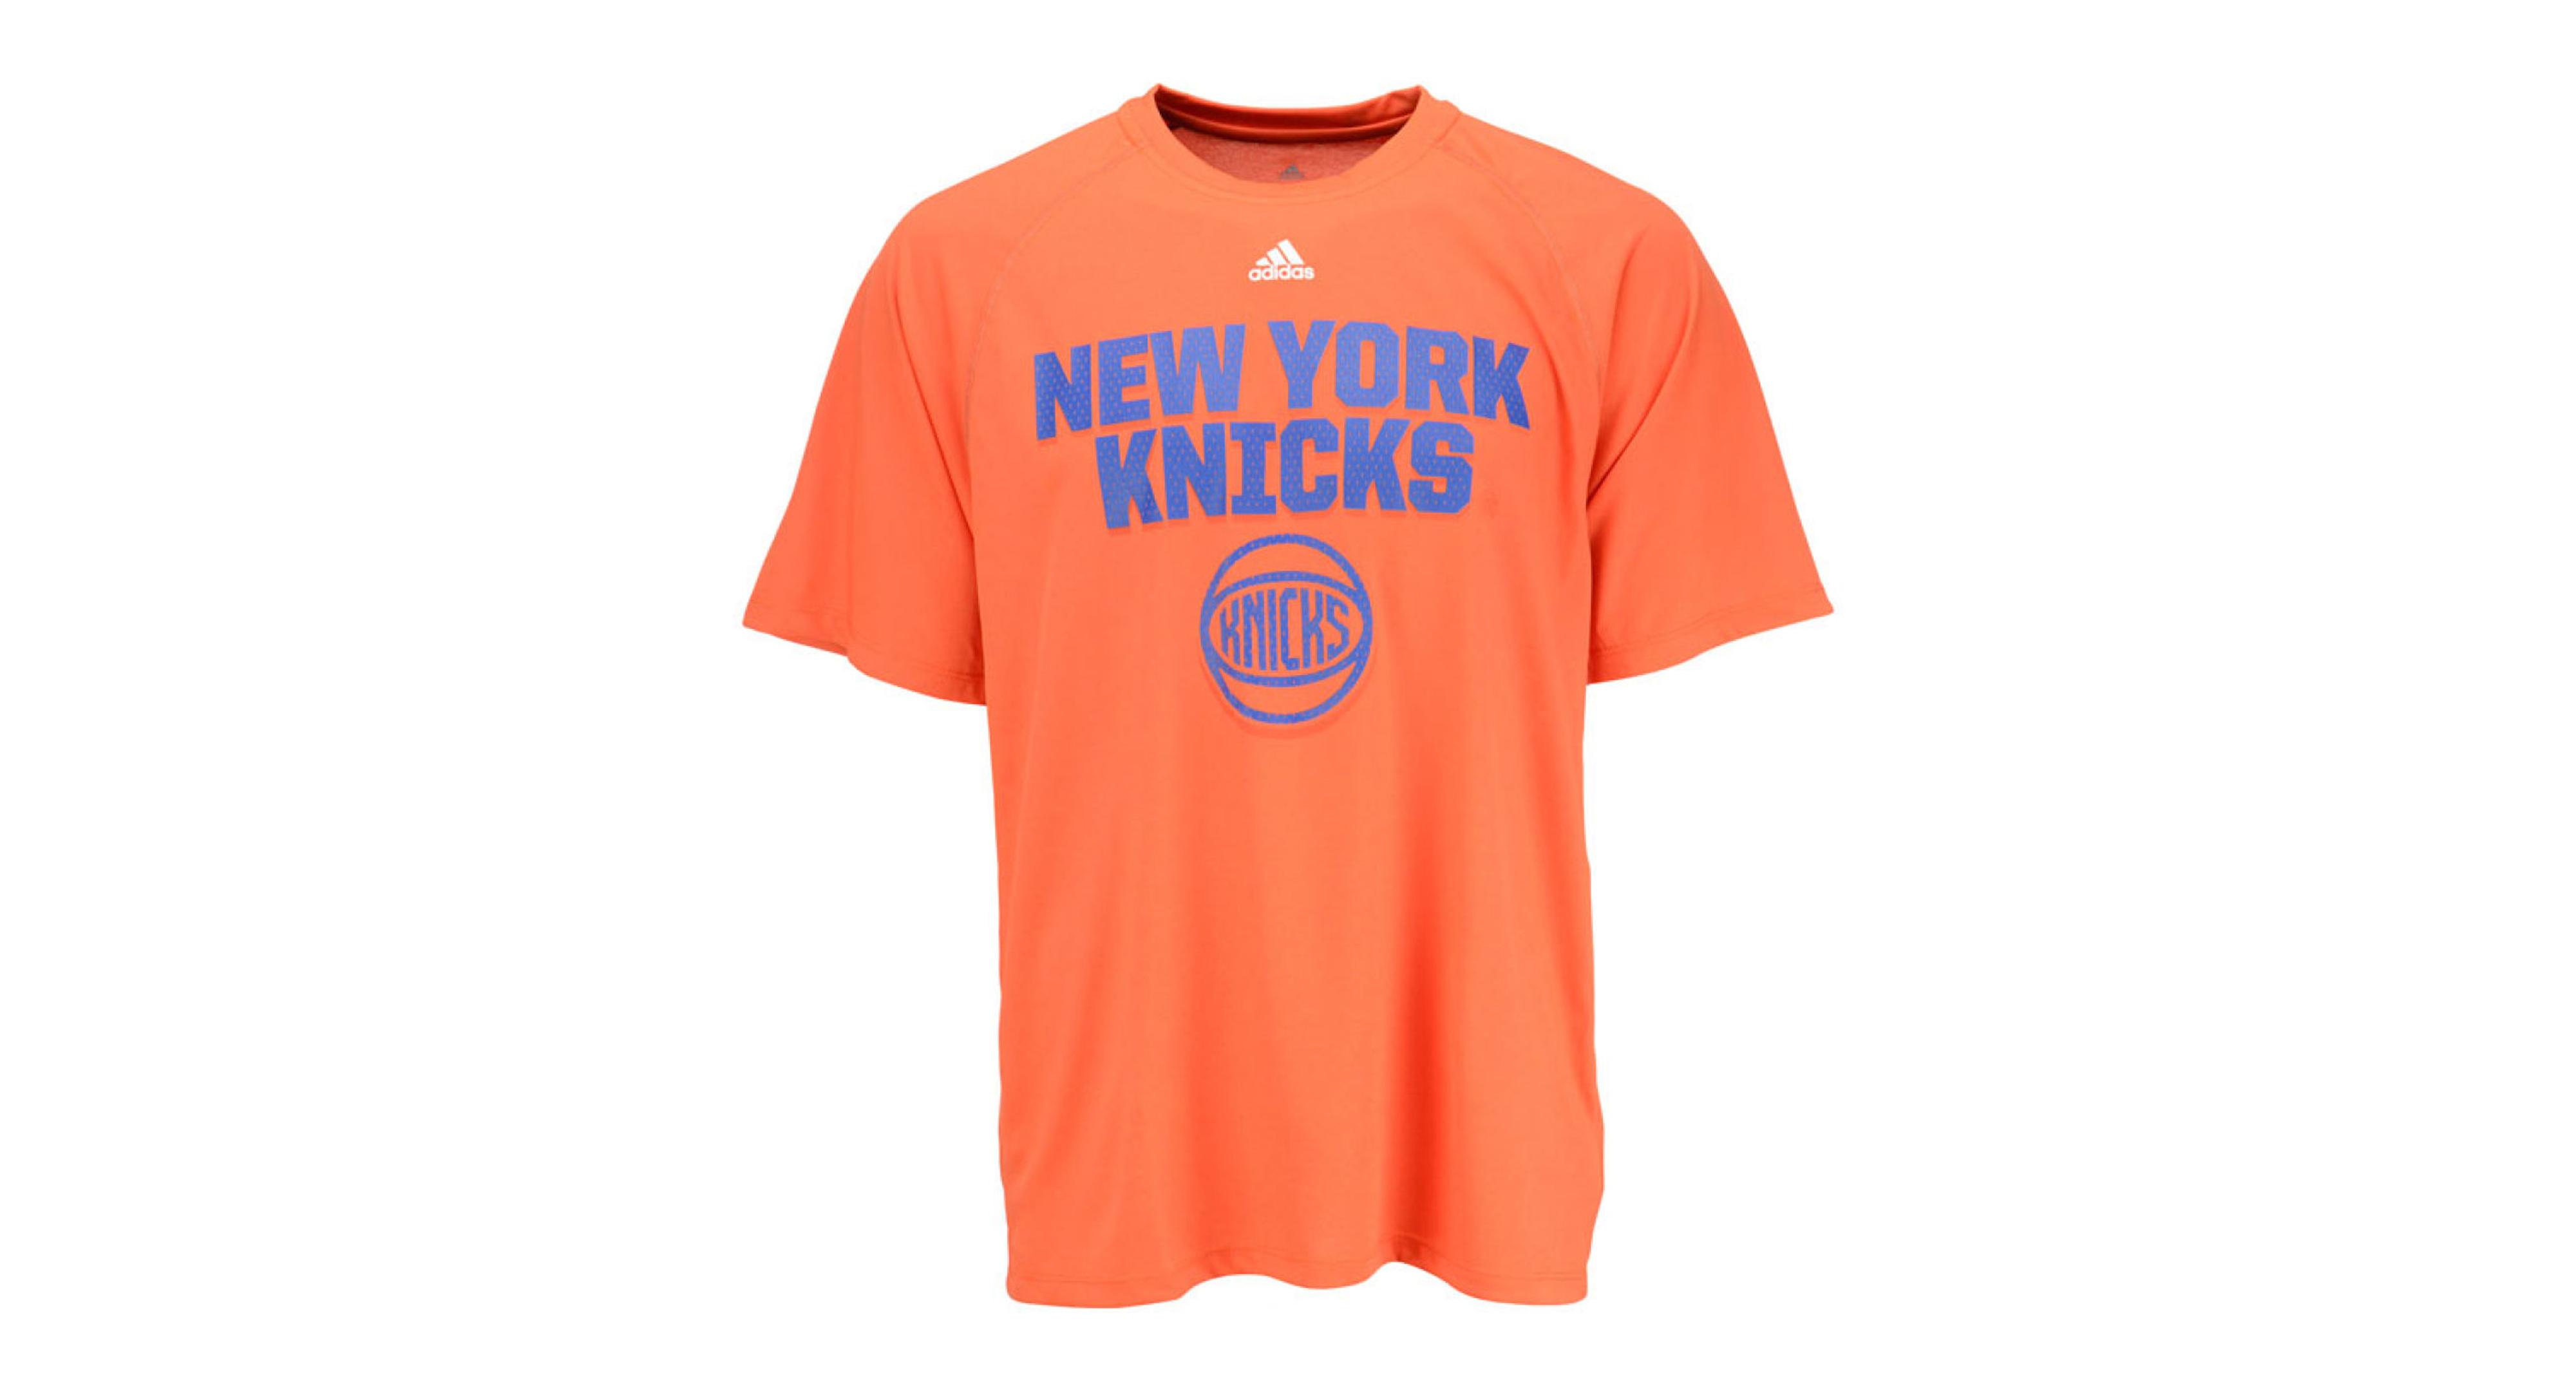 9bd1e4fa05207 New York Knicks Climalite T Shirt | Toffee Art